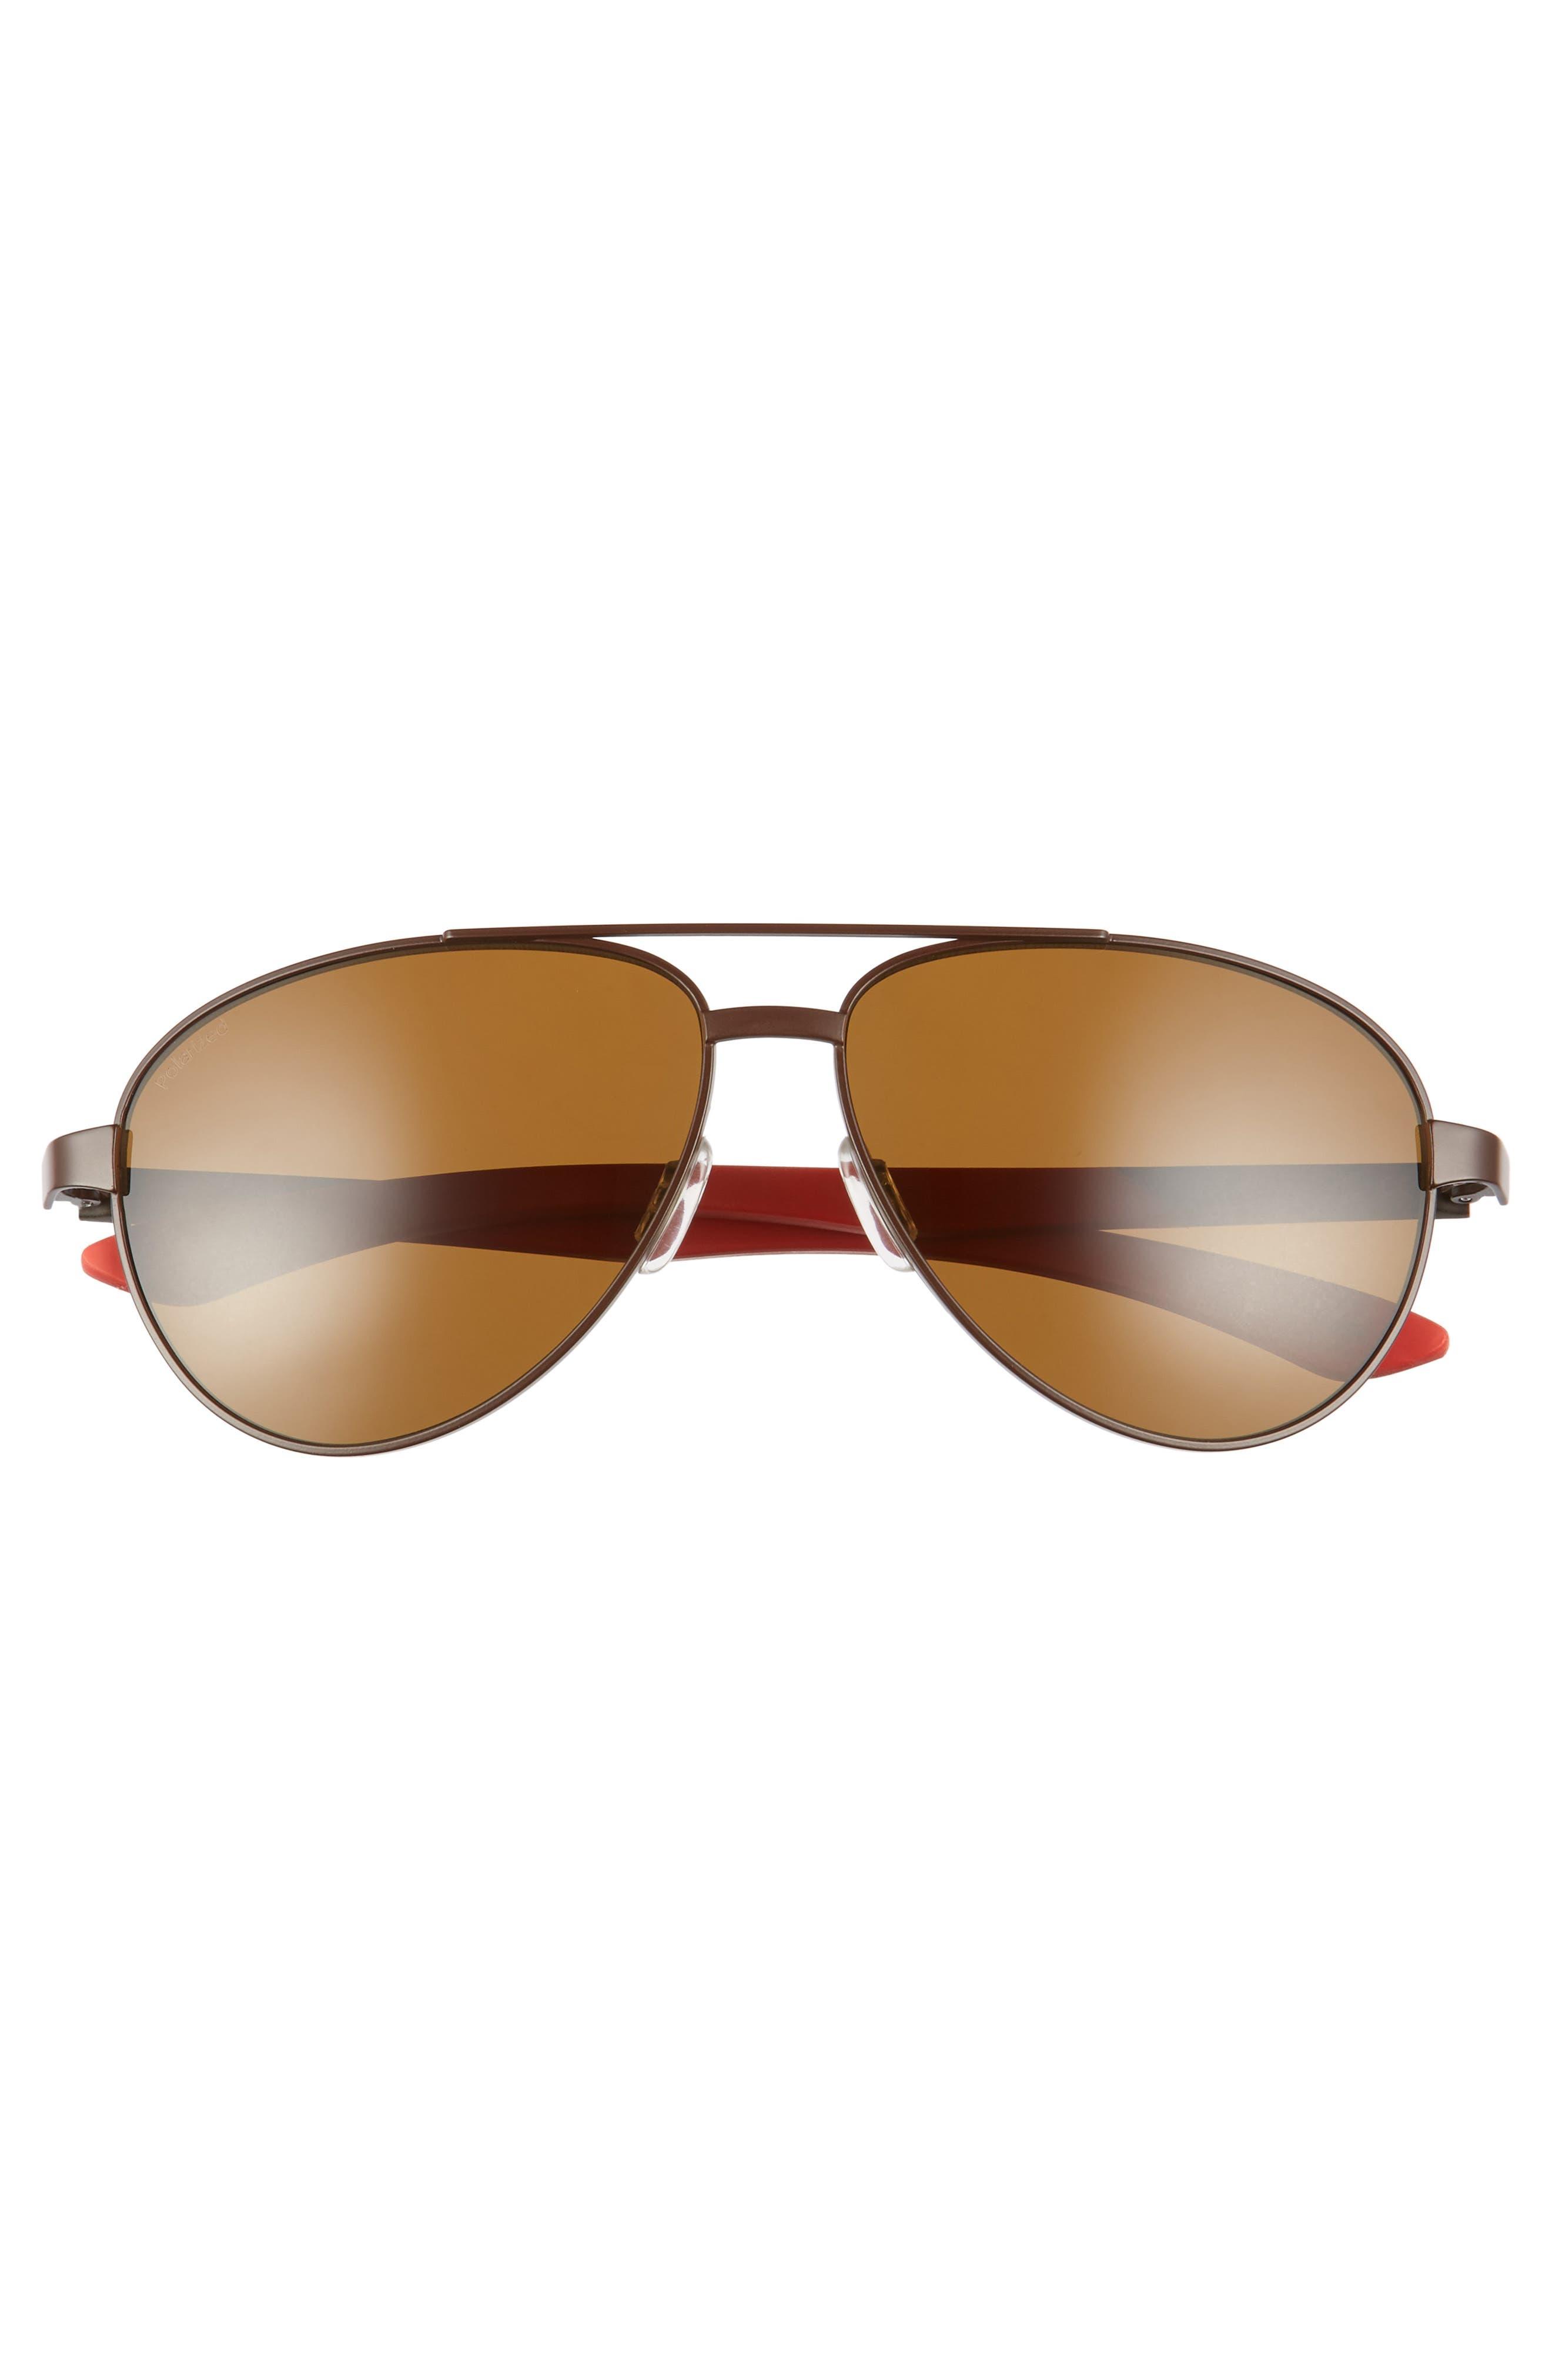 Salute 59mm Polarized Aviator Sunglasses,                             Alternate thumbnail 3, color,                             200